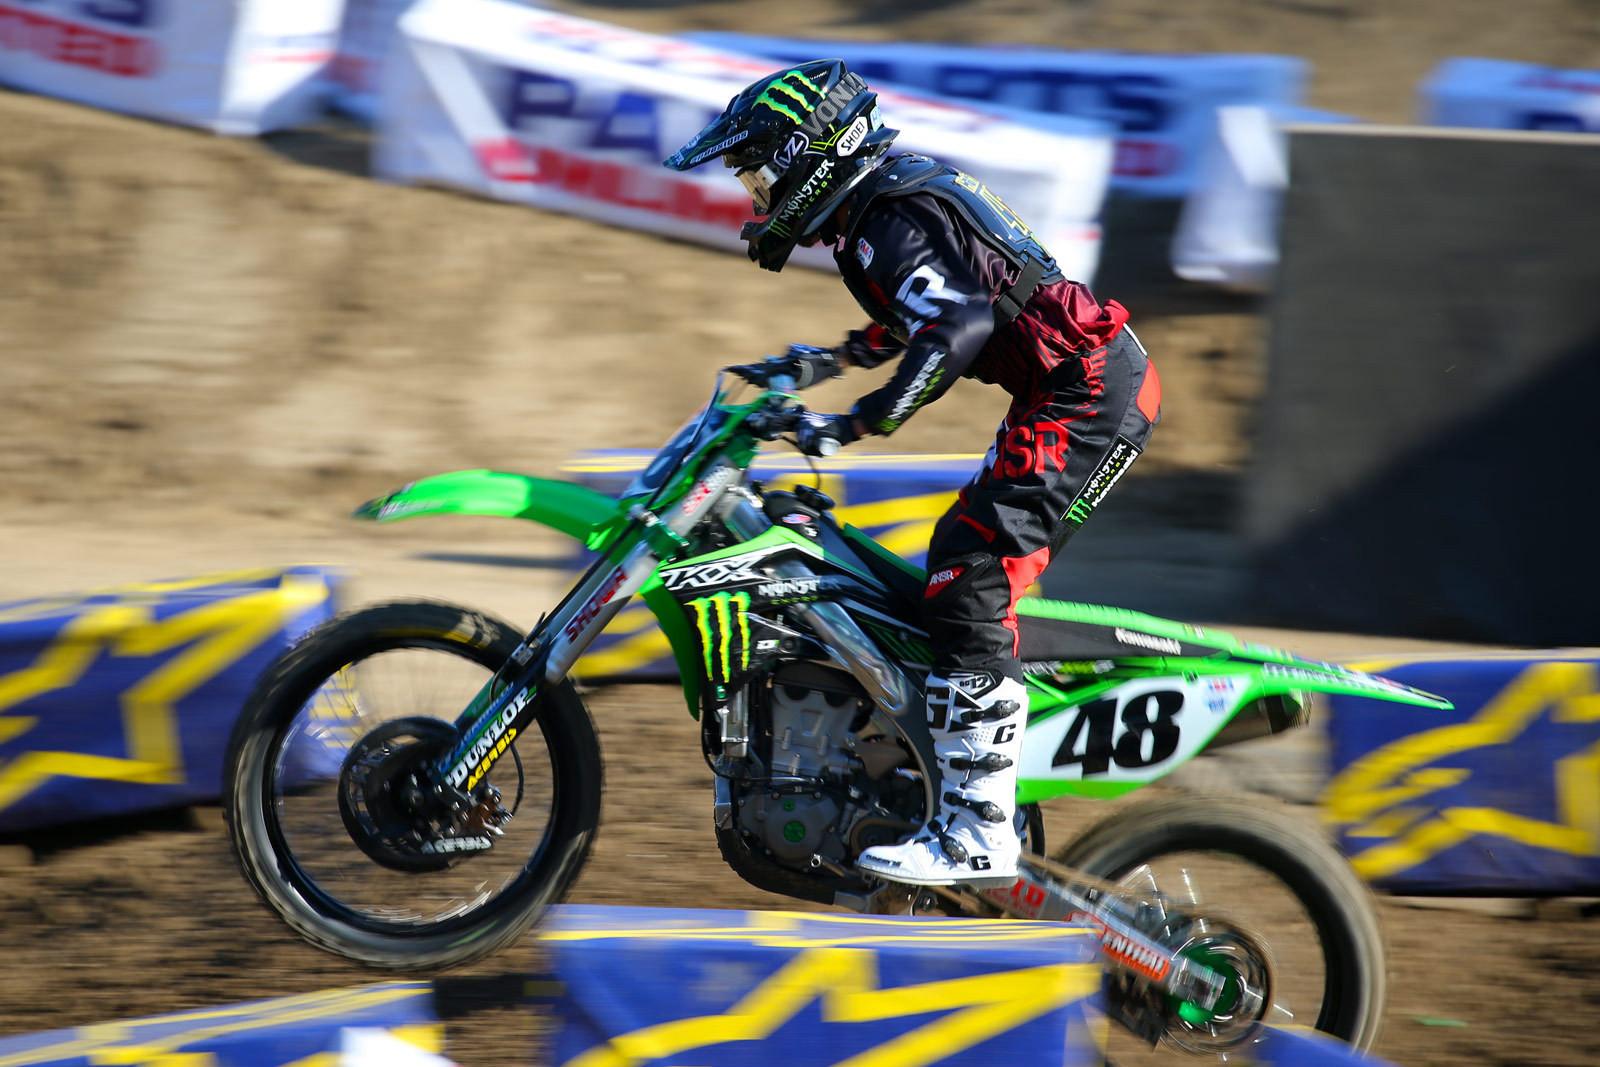 2015 Anaheim 1 Supercross